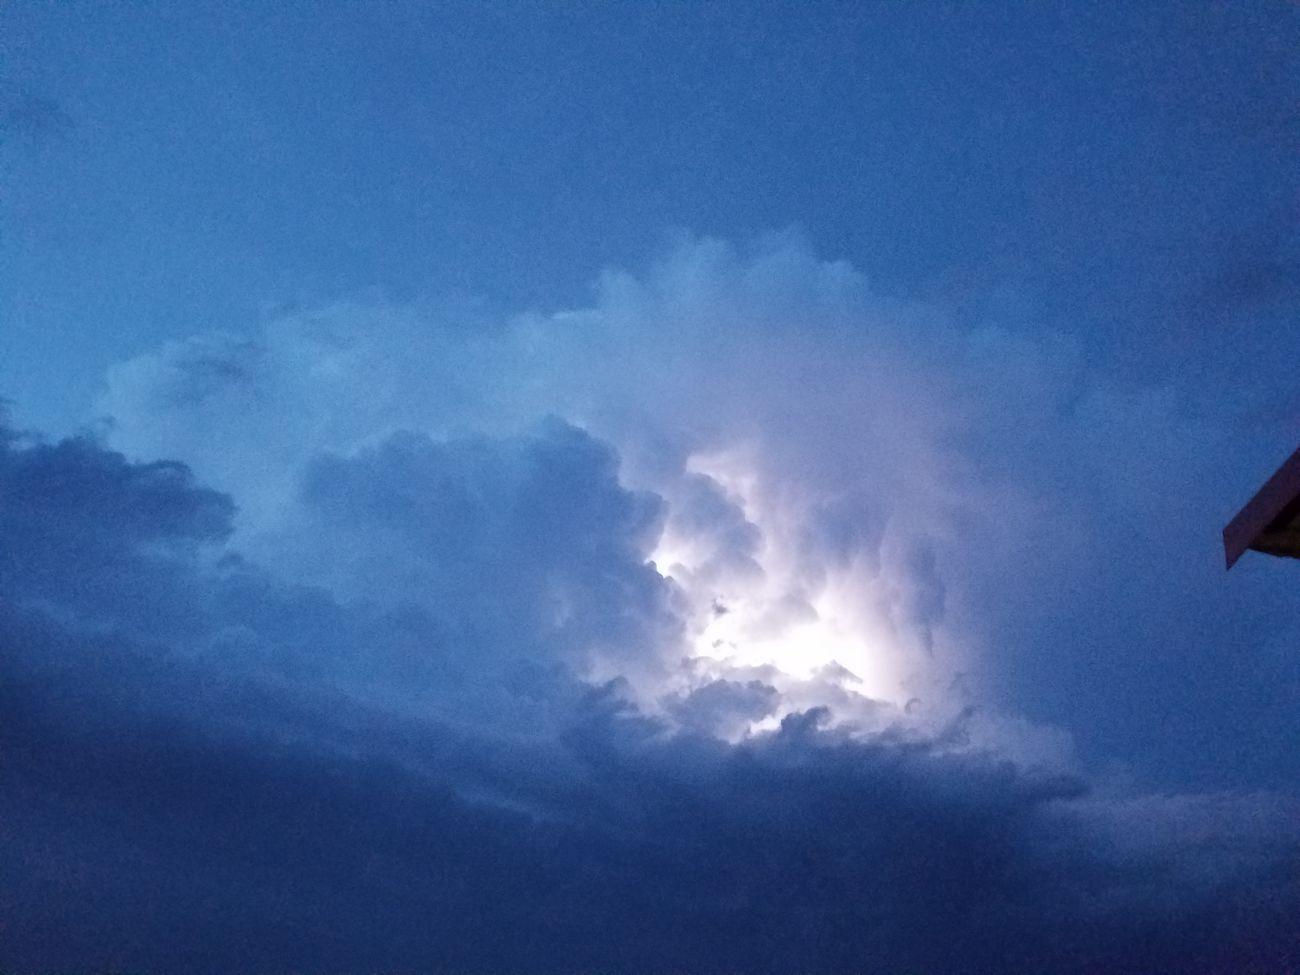 Lightning behind clouds Lightning Storm Sky Dark Clouds Nature Light Bright Ujustgotkaied